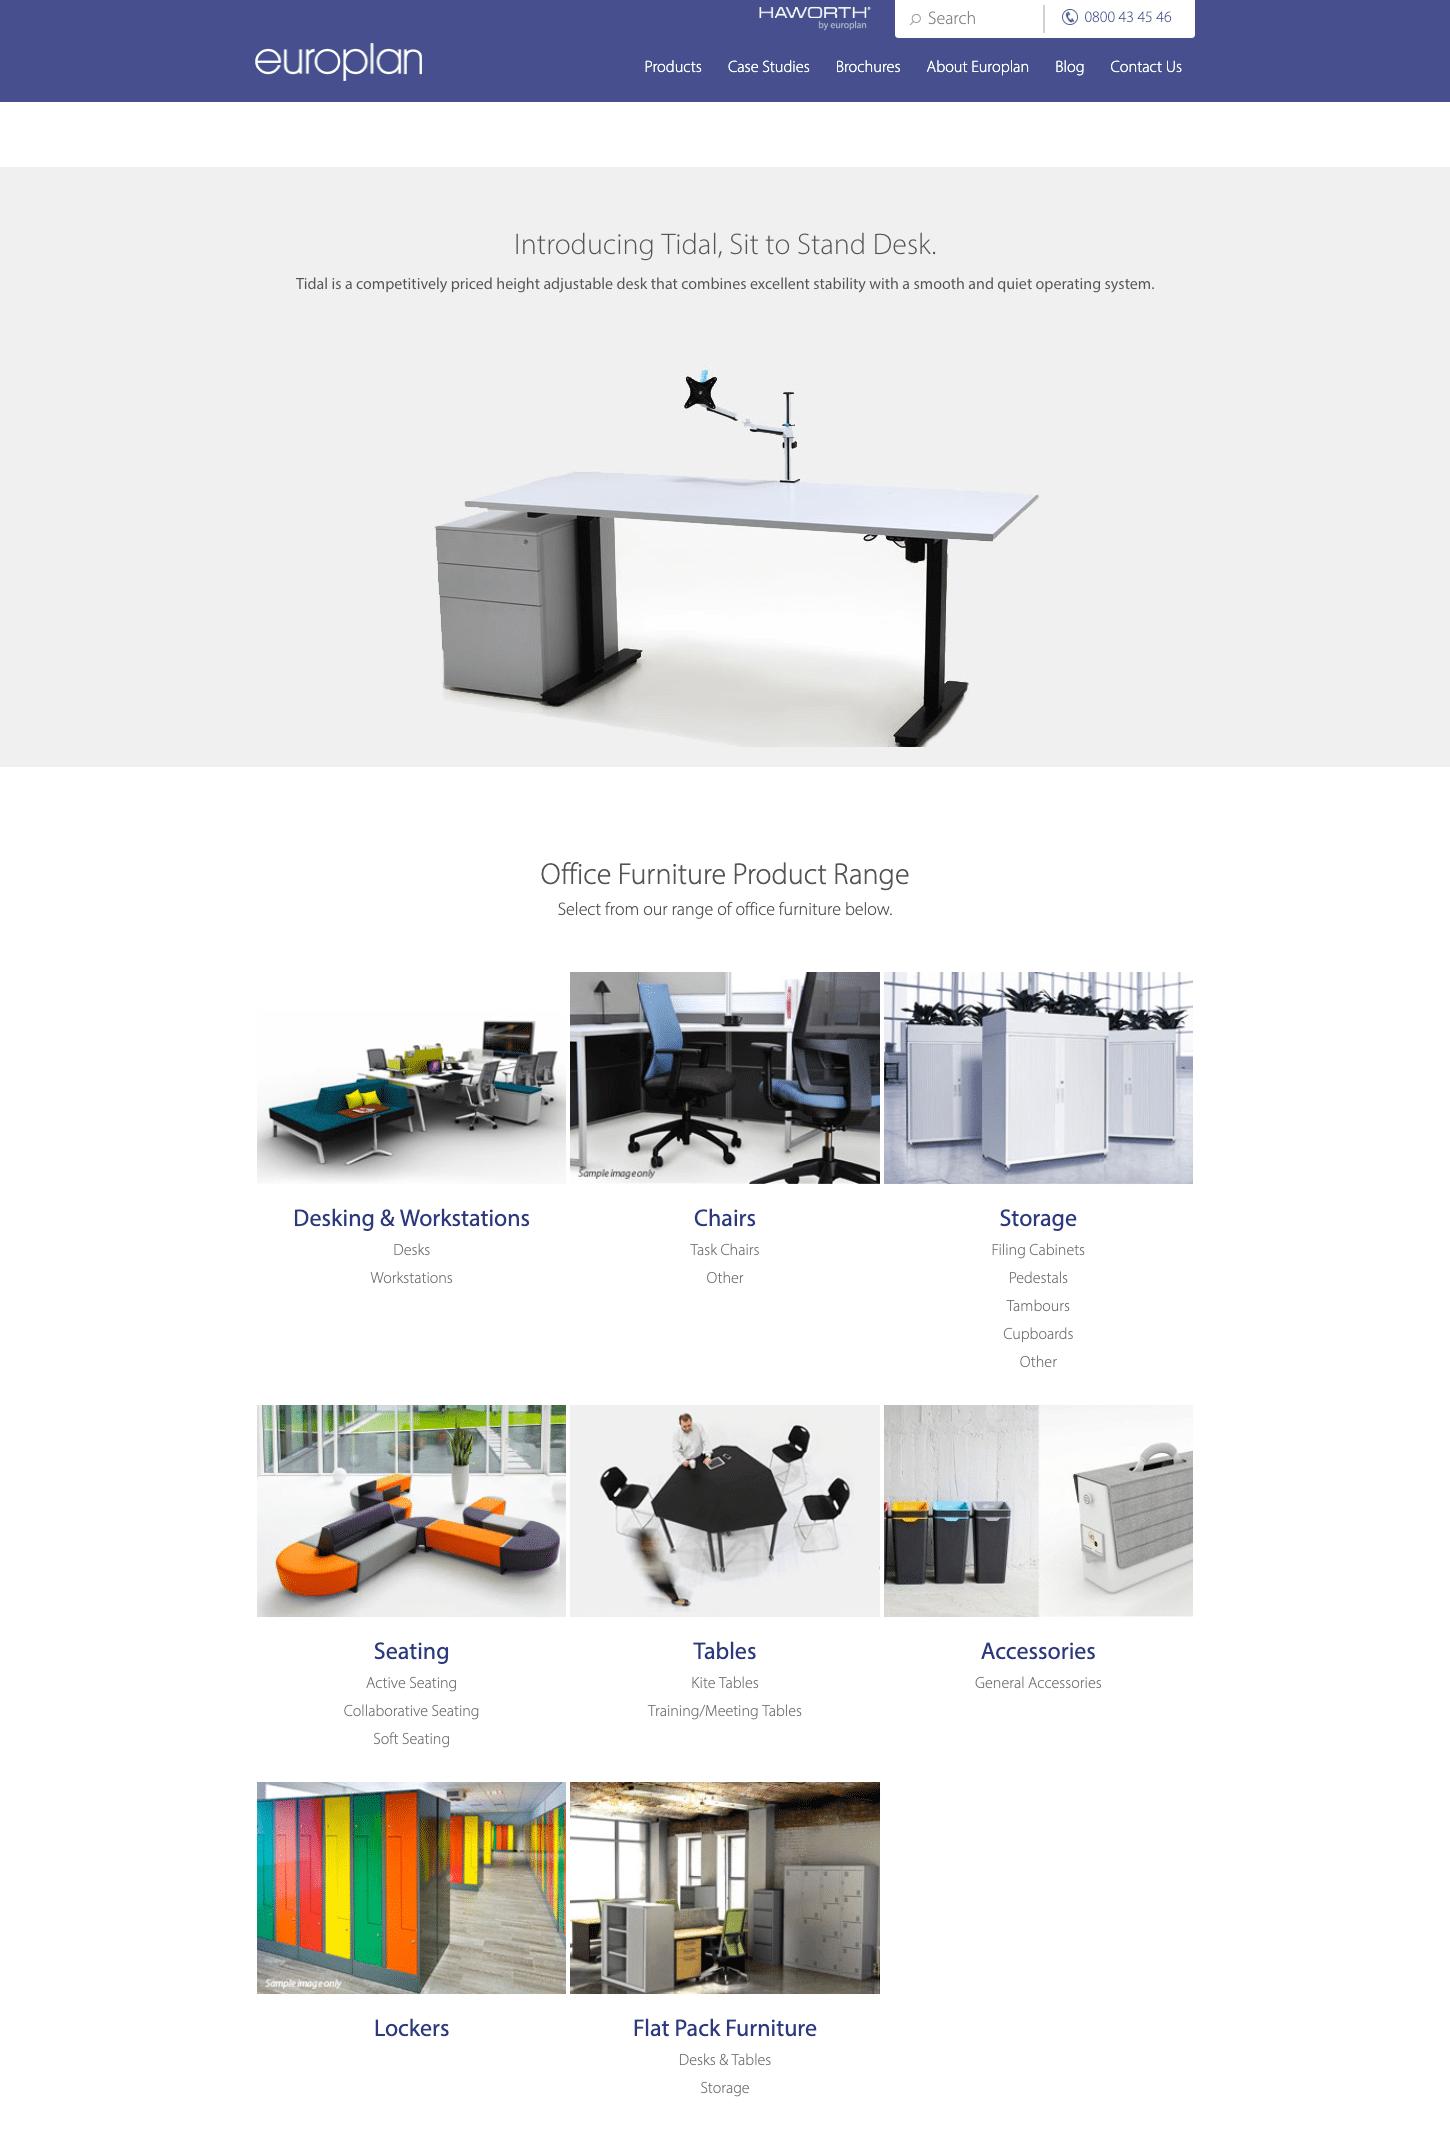 ba europlan website redesign before dt